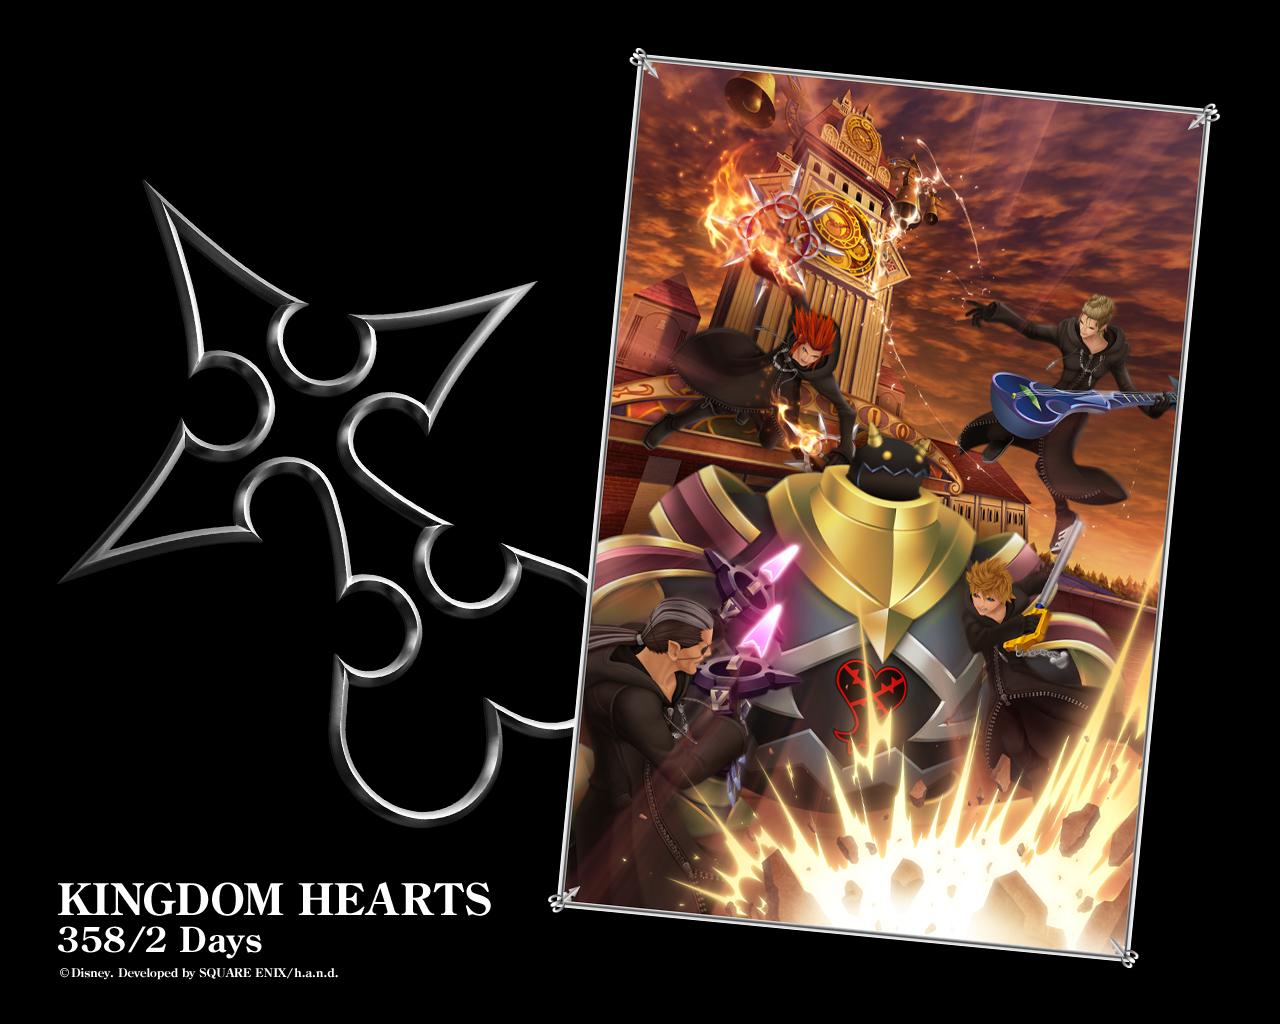 Kingdom Hearts 358 1 2 Days Wallpaper 5 1280 1024